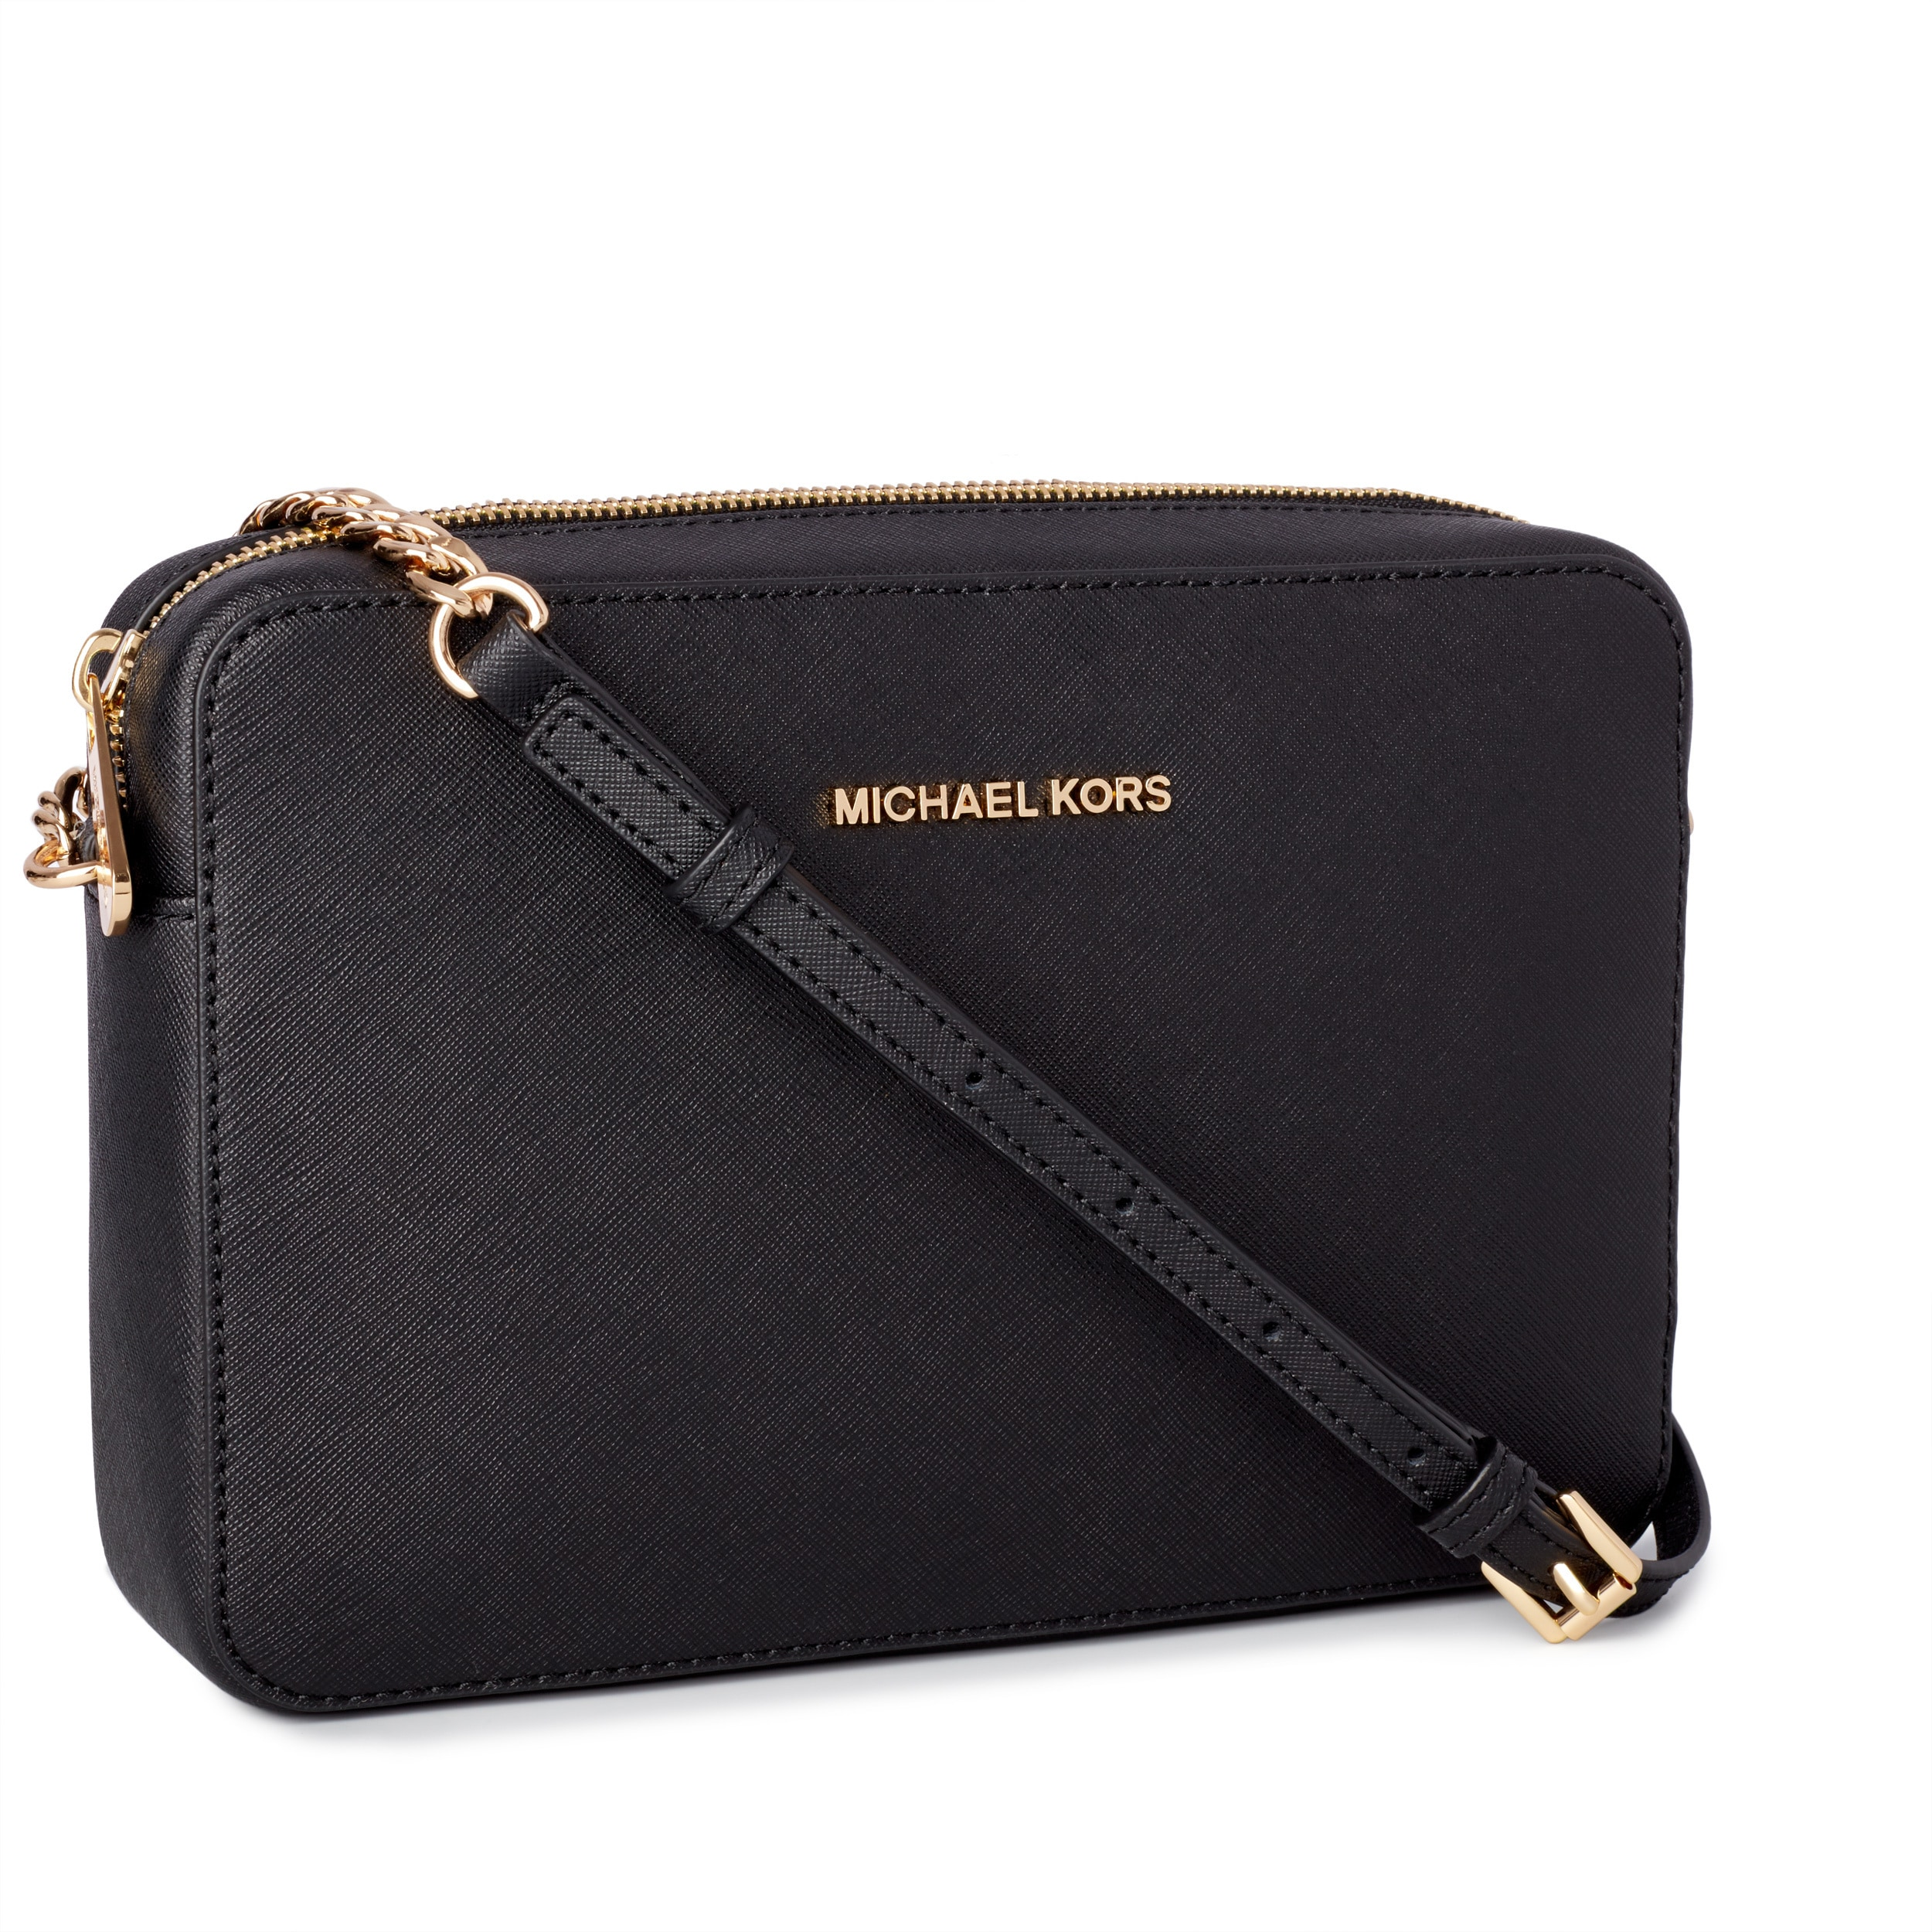 michael kors black crossbody purses